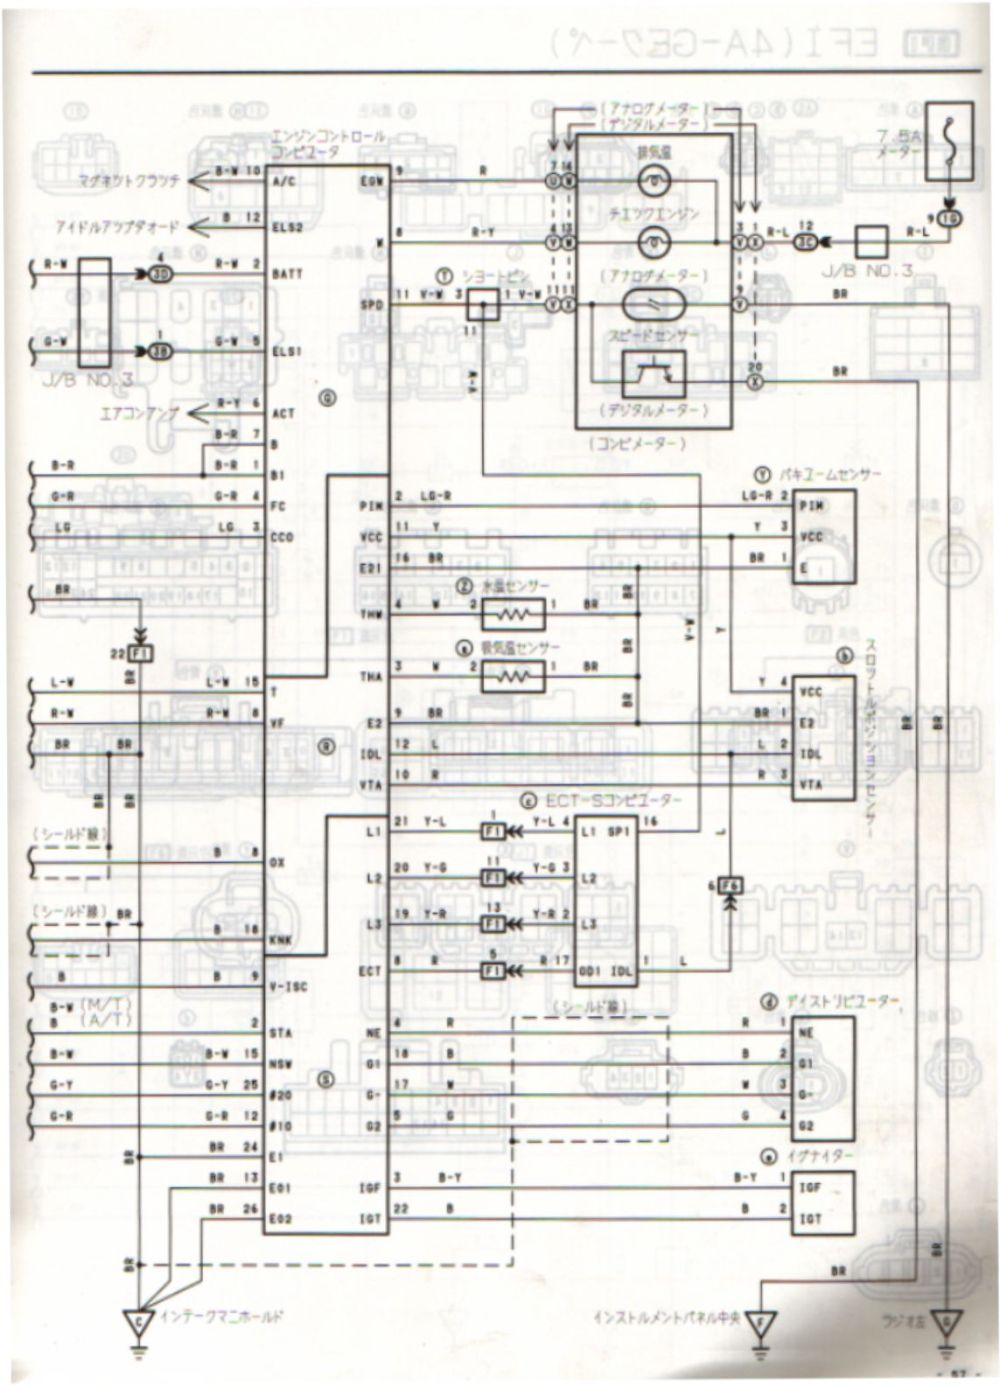 Toyotum Ke30 Wiring Diagram Toyota Medium Resolution Of